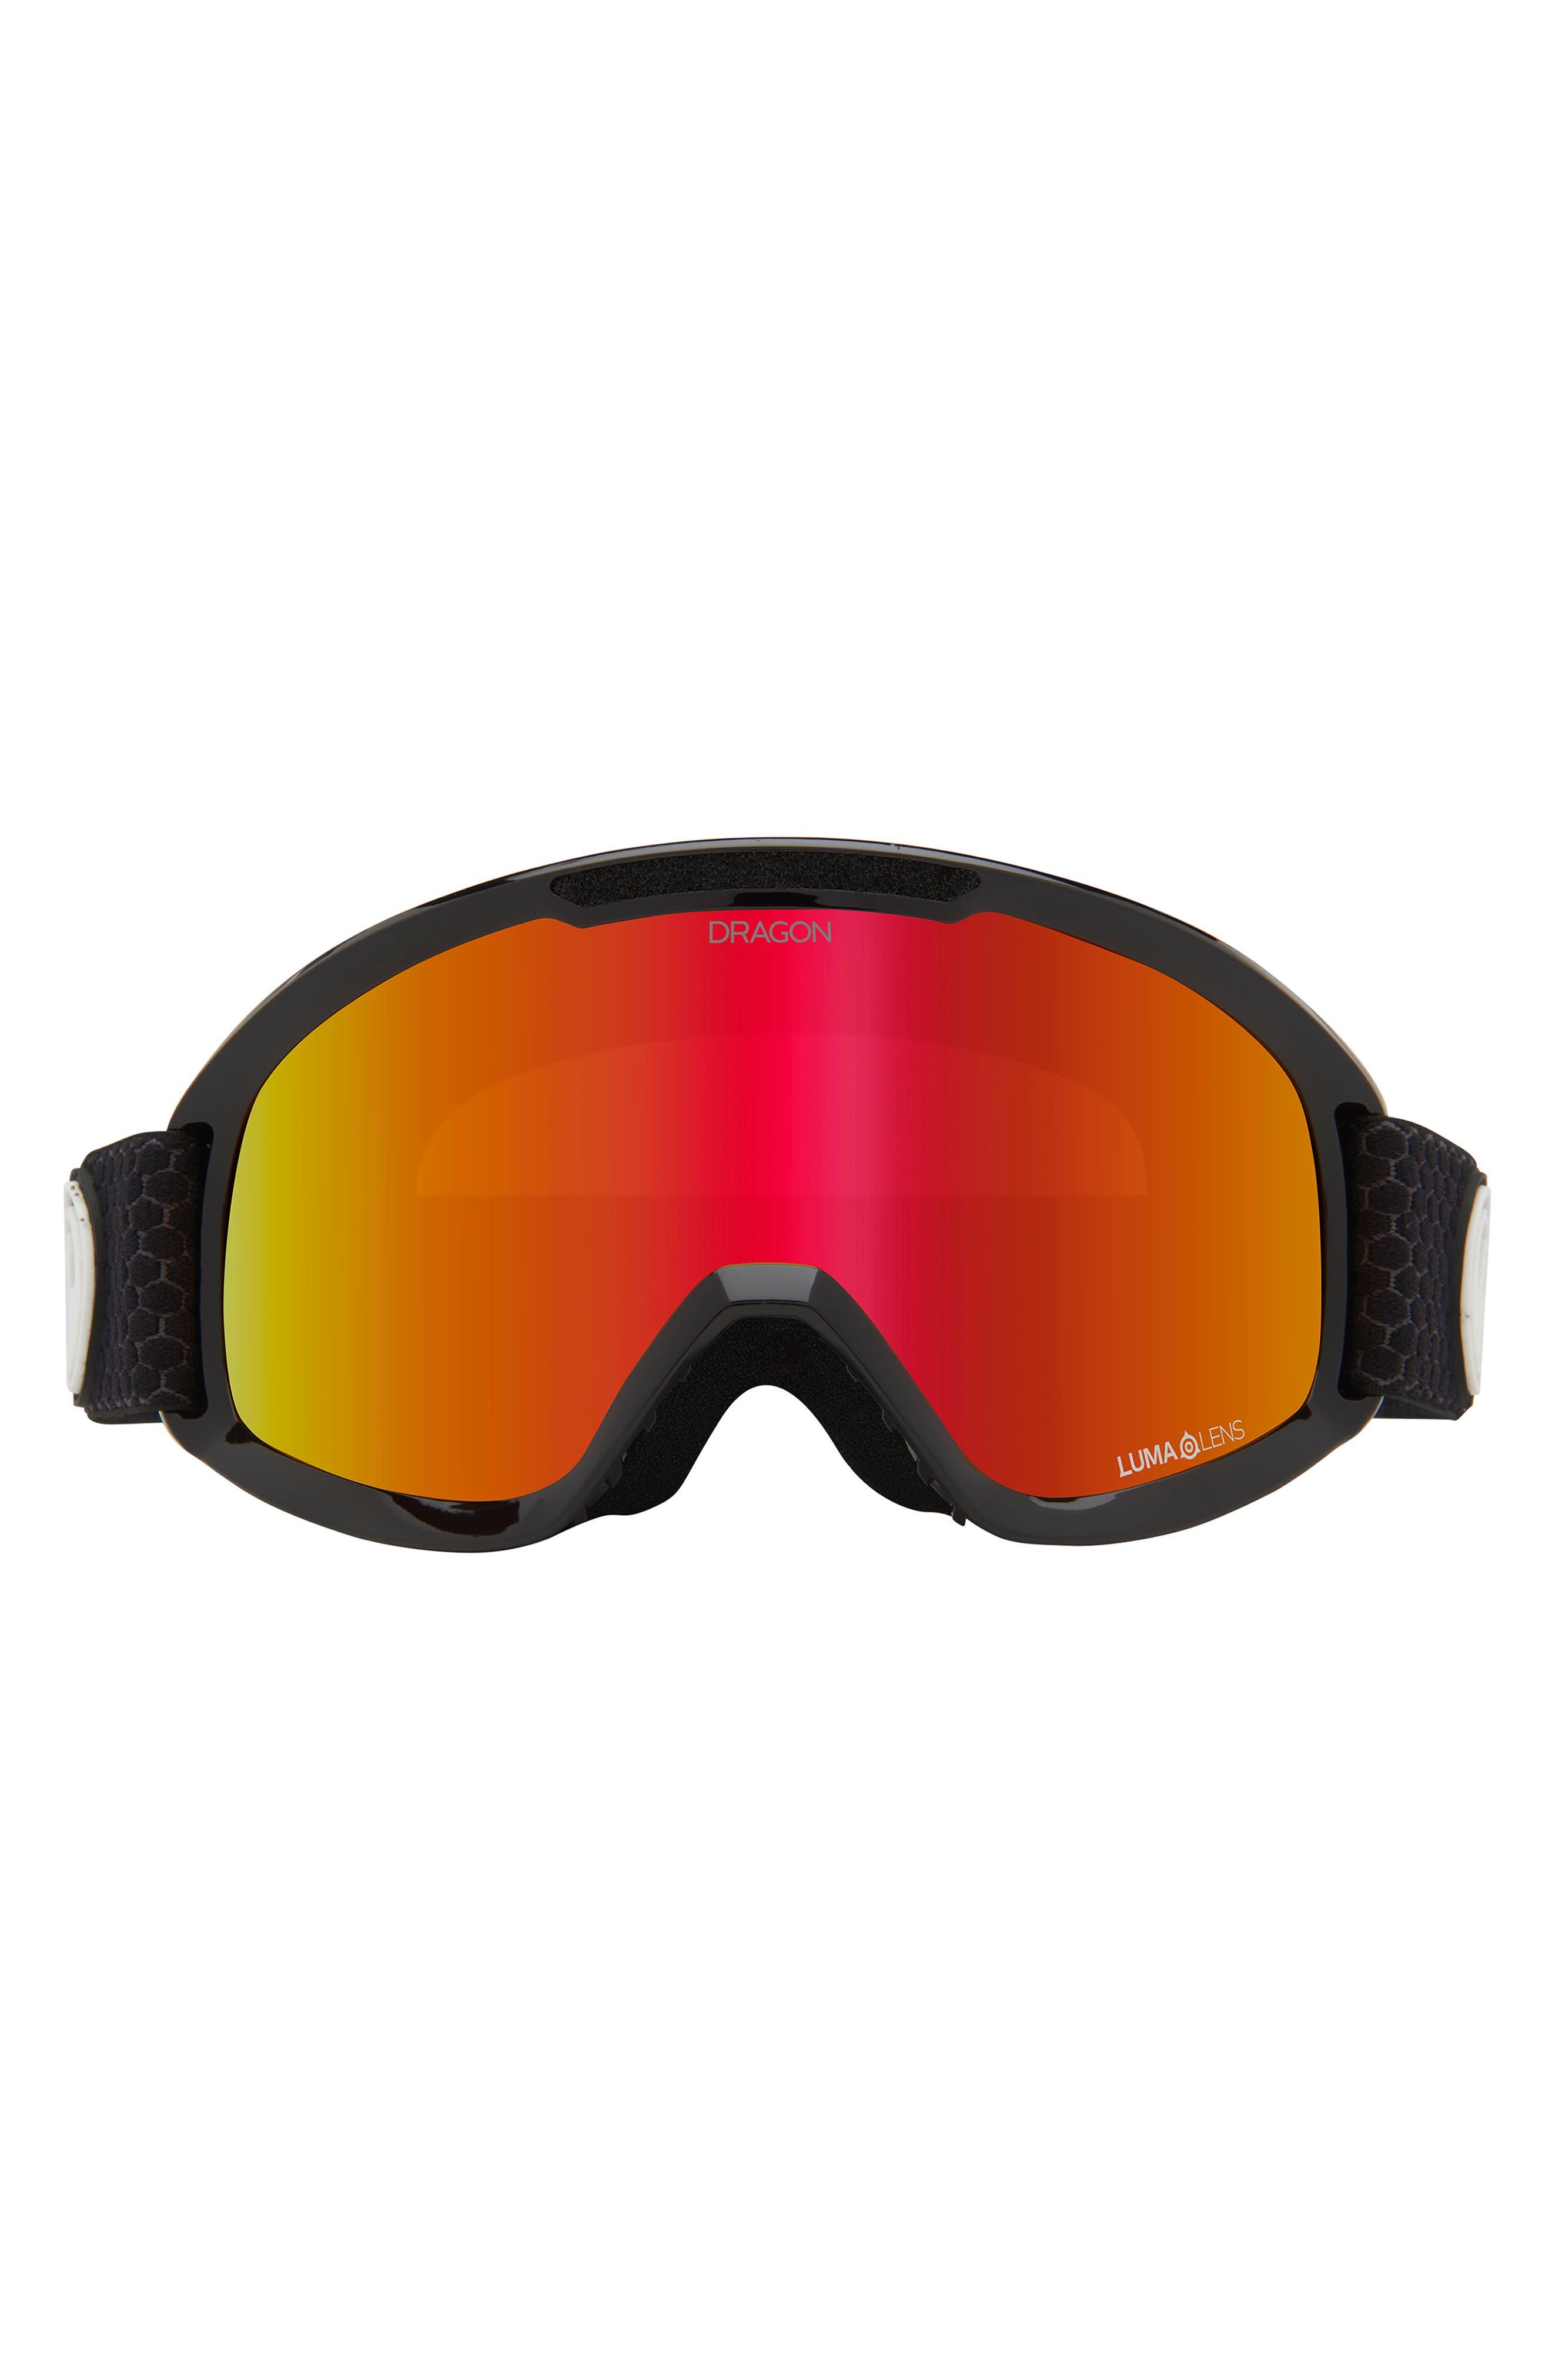 Dx2 51mm Snow Goggles With Bonus Lens